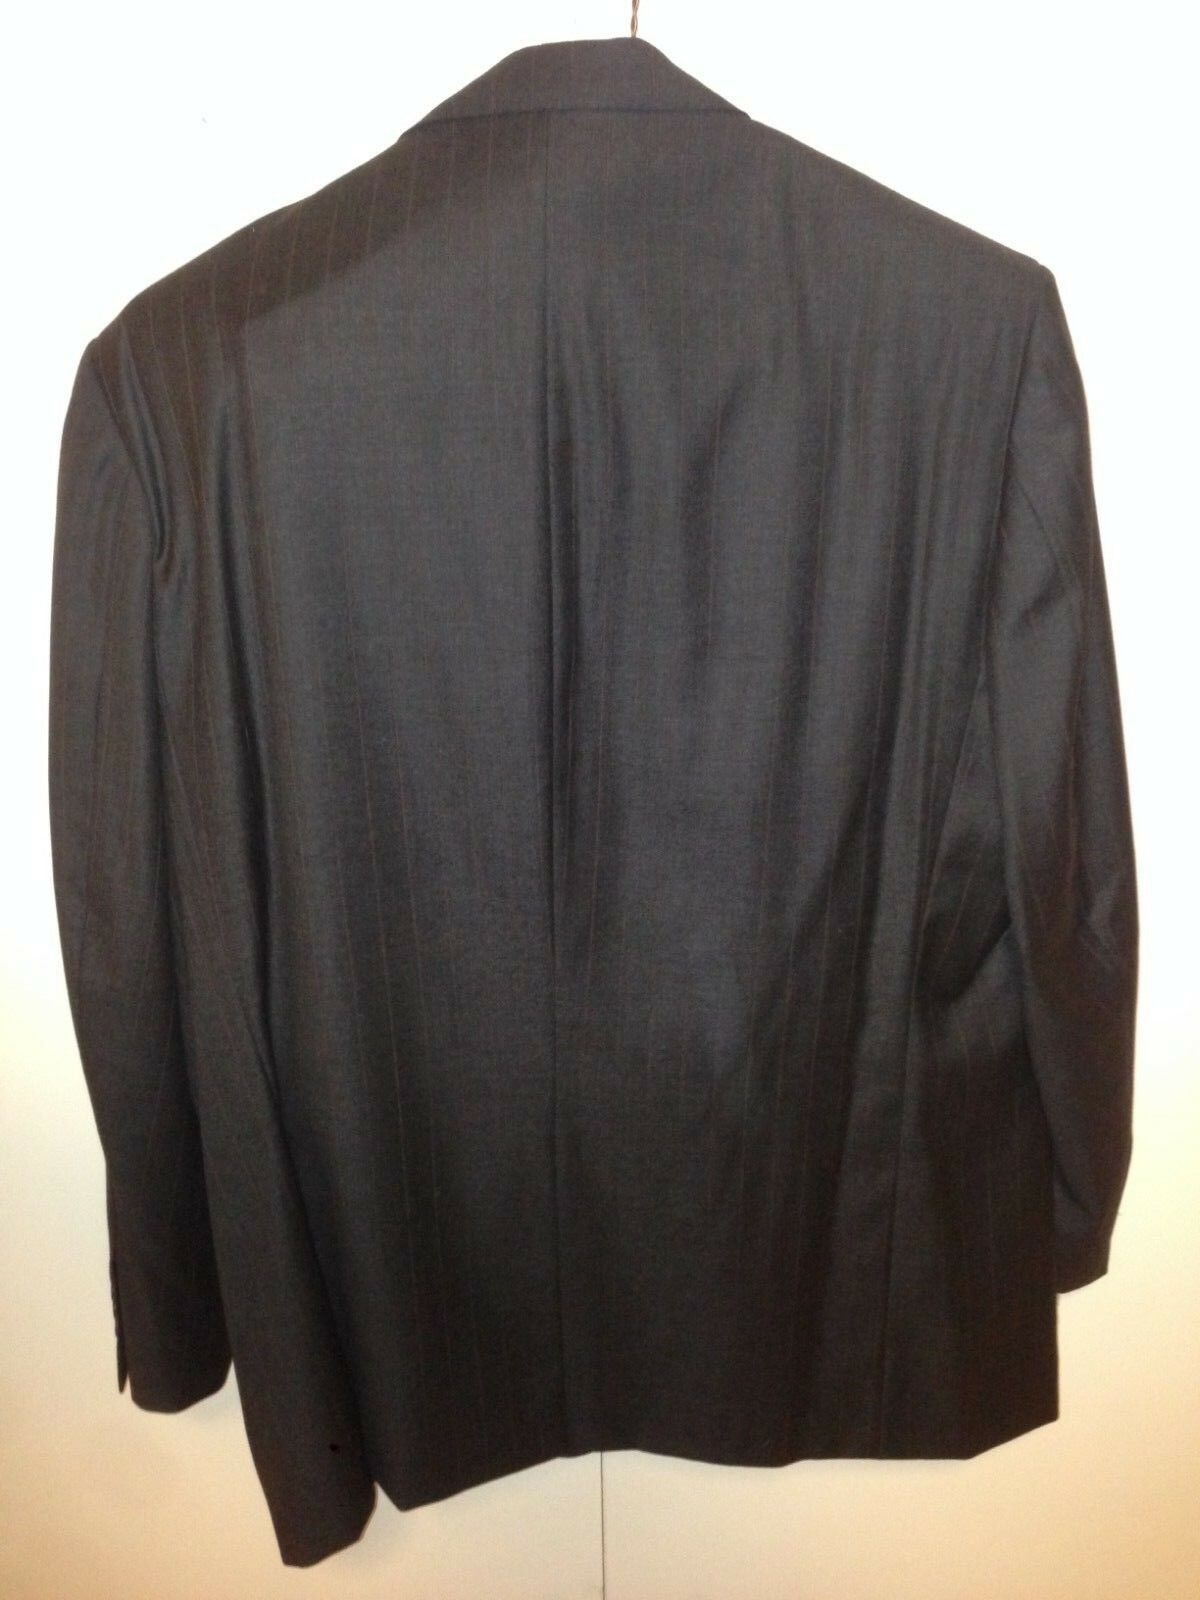 Brooks Brothers  2 Piece Piece Piece Suit Charcoal Gris Pin Striped Size 46R  Pant 32x29 ce5e82